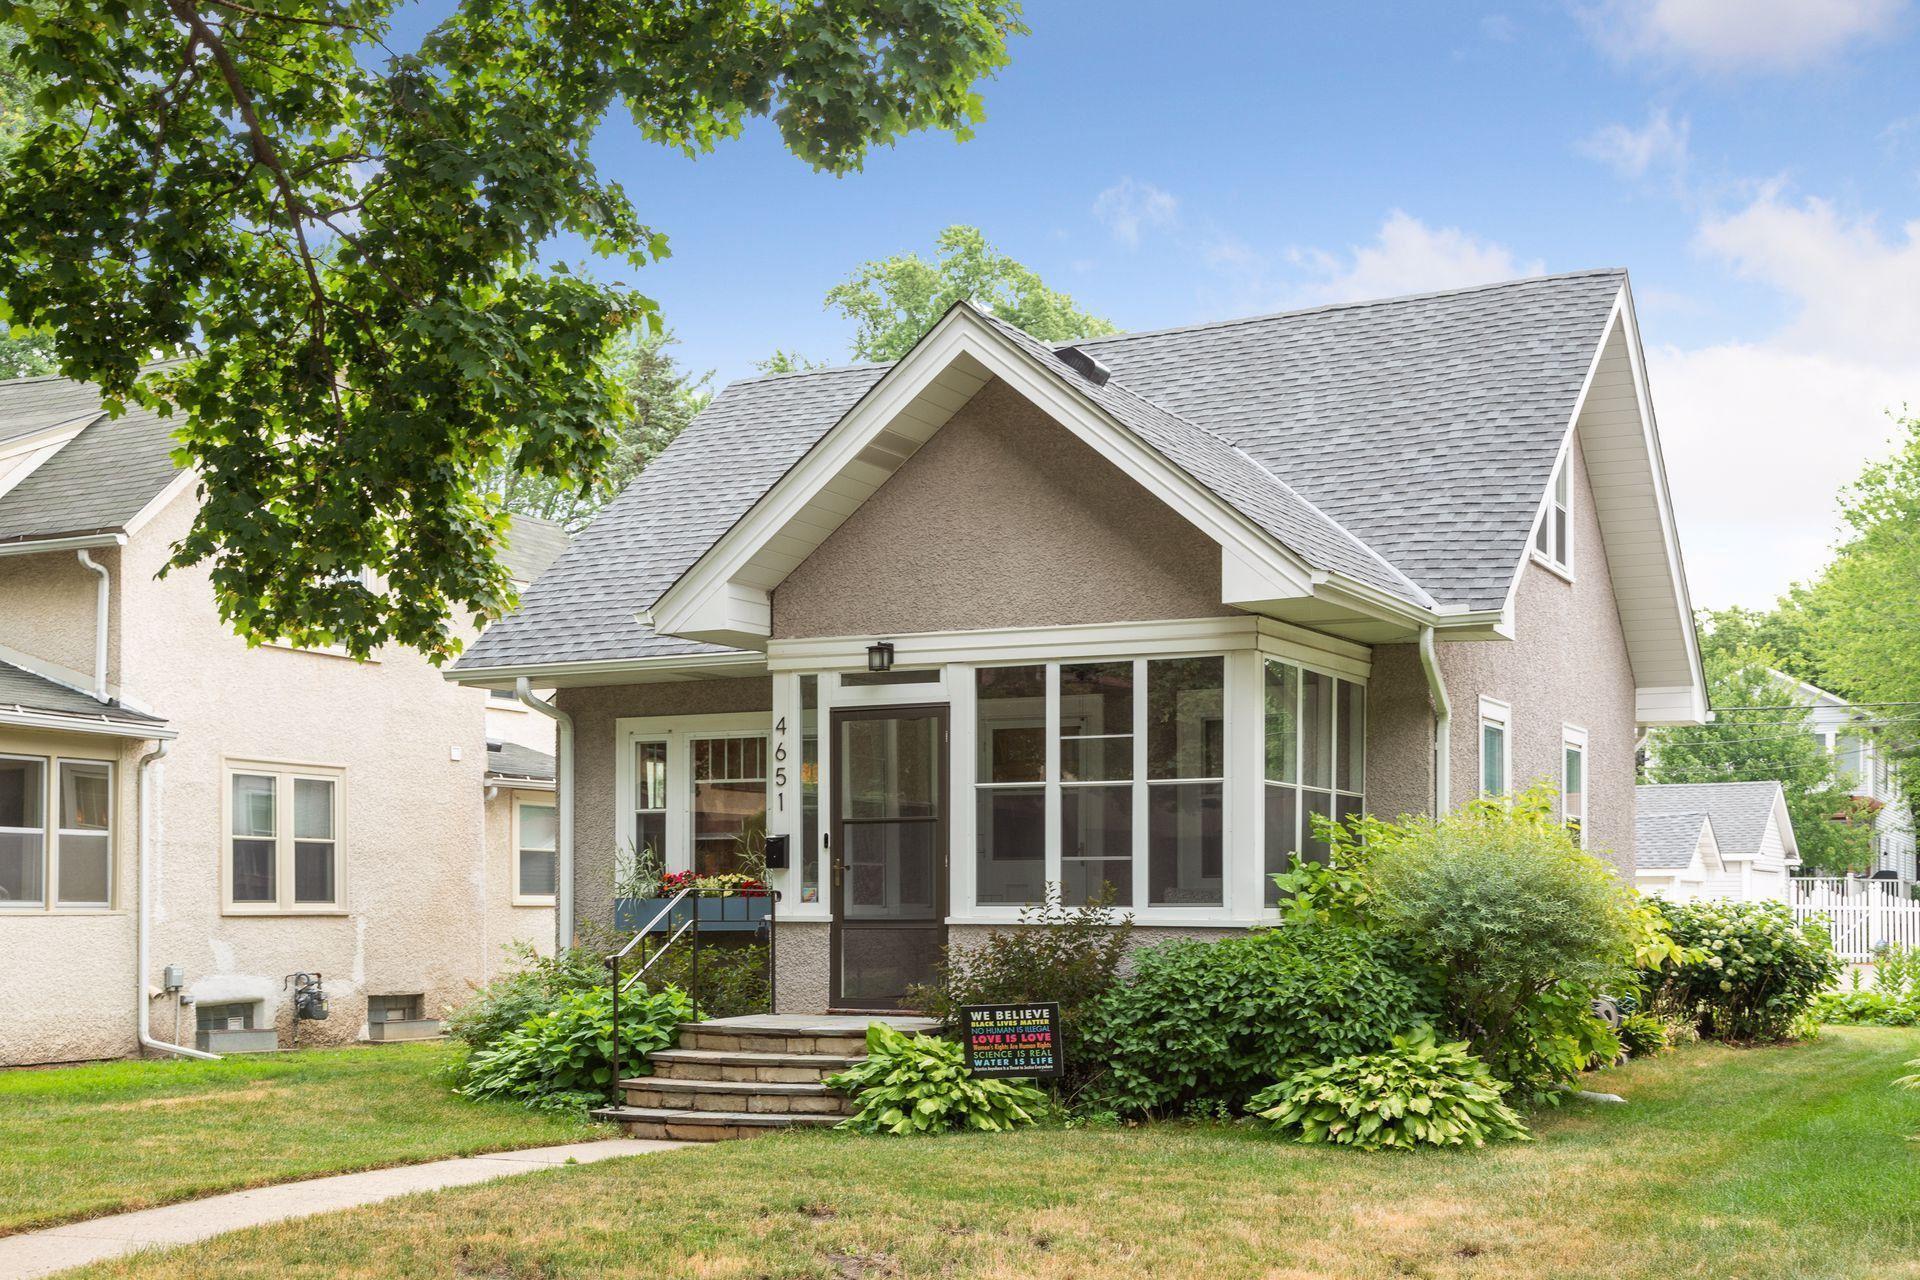 Photo of 4651 Garfield Avenue, Minneapolis, MN 55419 (MLS # 6029772)